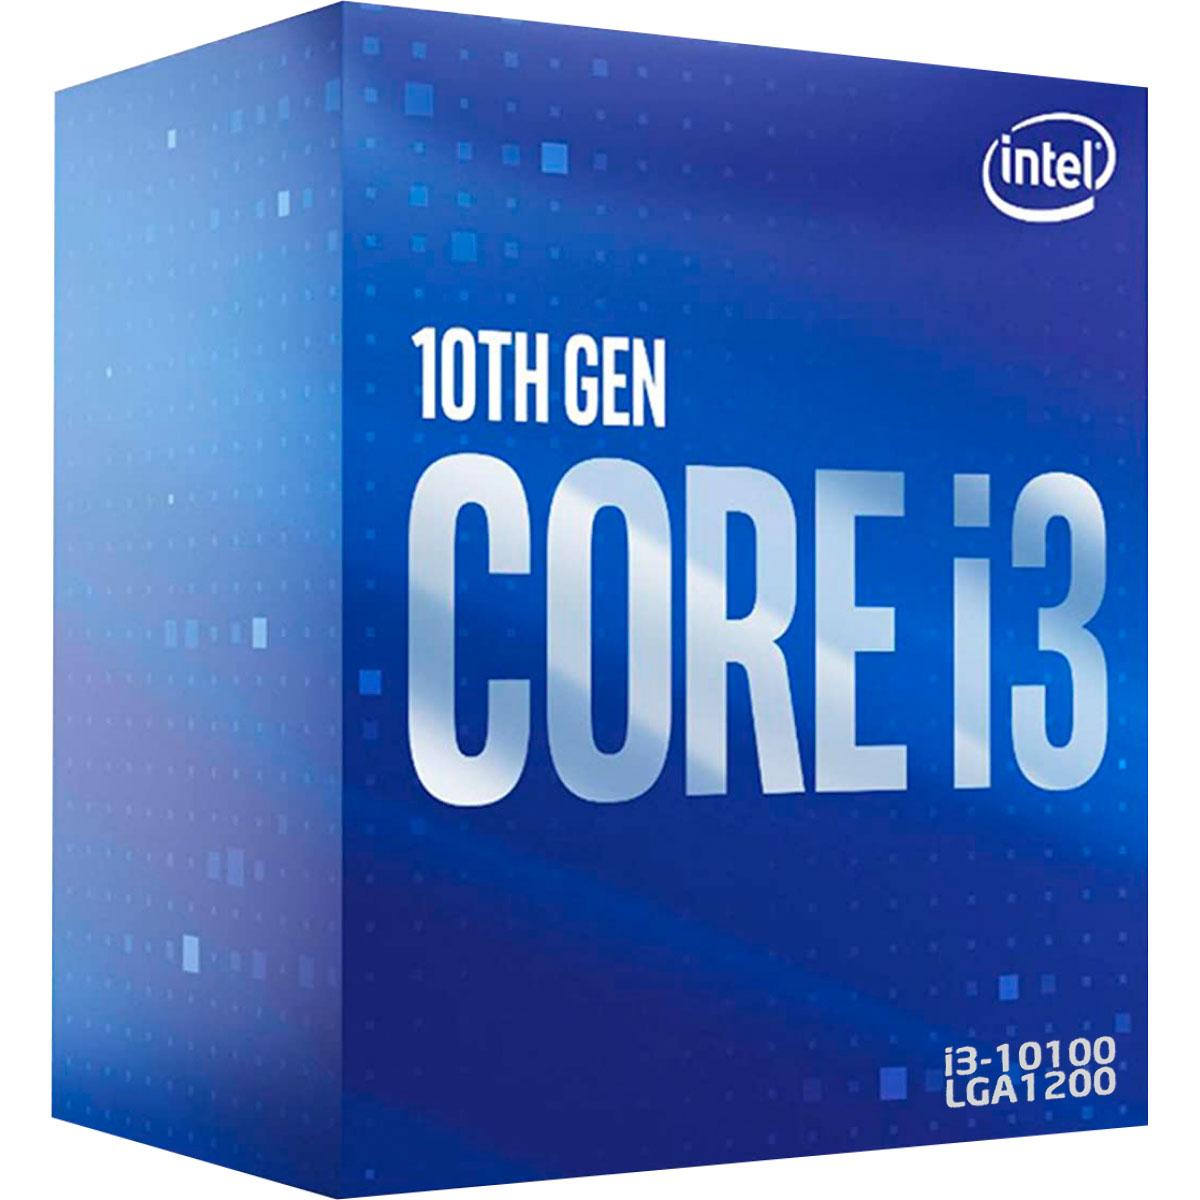 Processador Intel Core I3-10100 3.60GHz (4.3GHz Turbo) Quad Core LGA1200 6MB Cache - BX8070110100